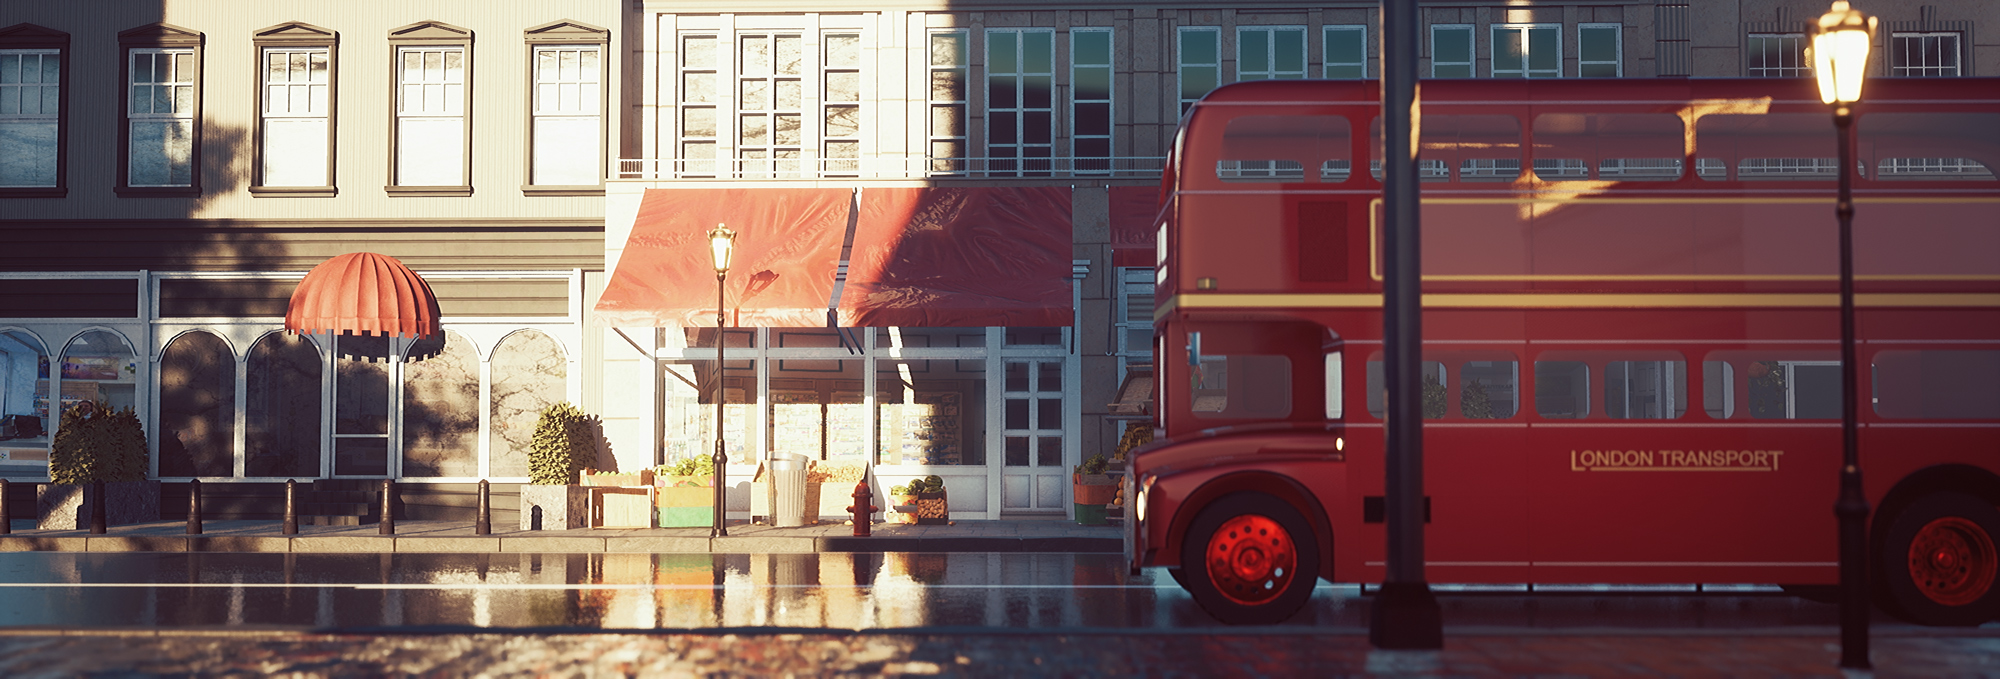 Londoner Day 3